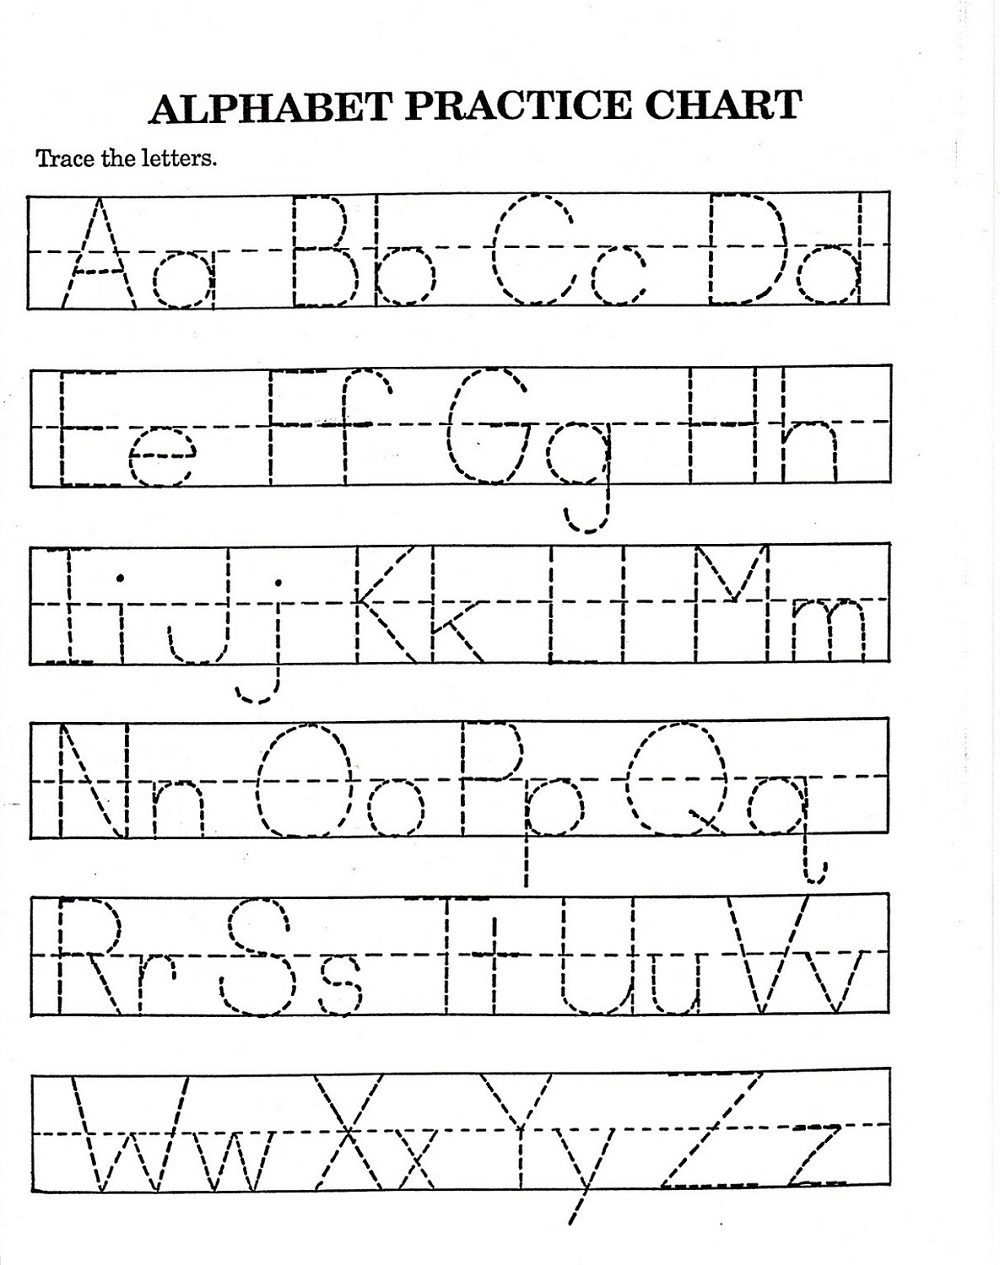 Traceable Alphabet Worksheets A-Z | Activity Shelter